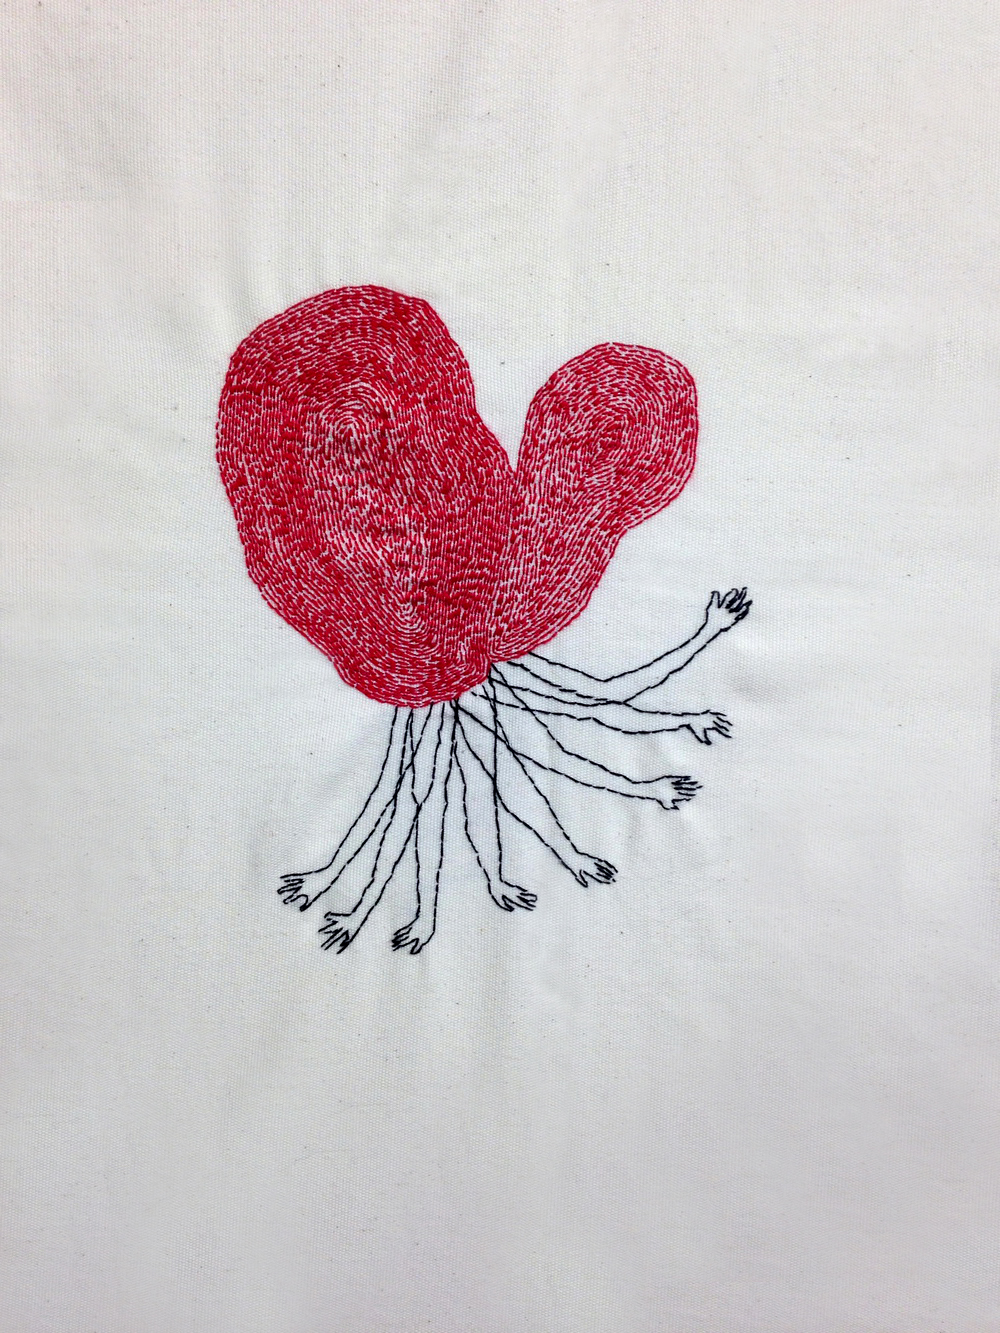 Spider | Hand sewn on Fabric | 35x45 cm